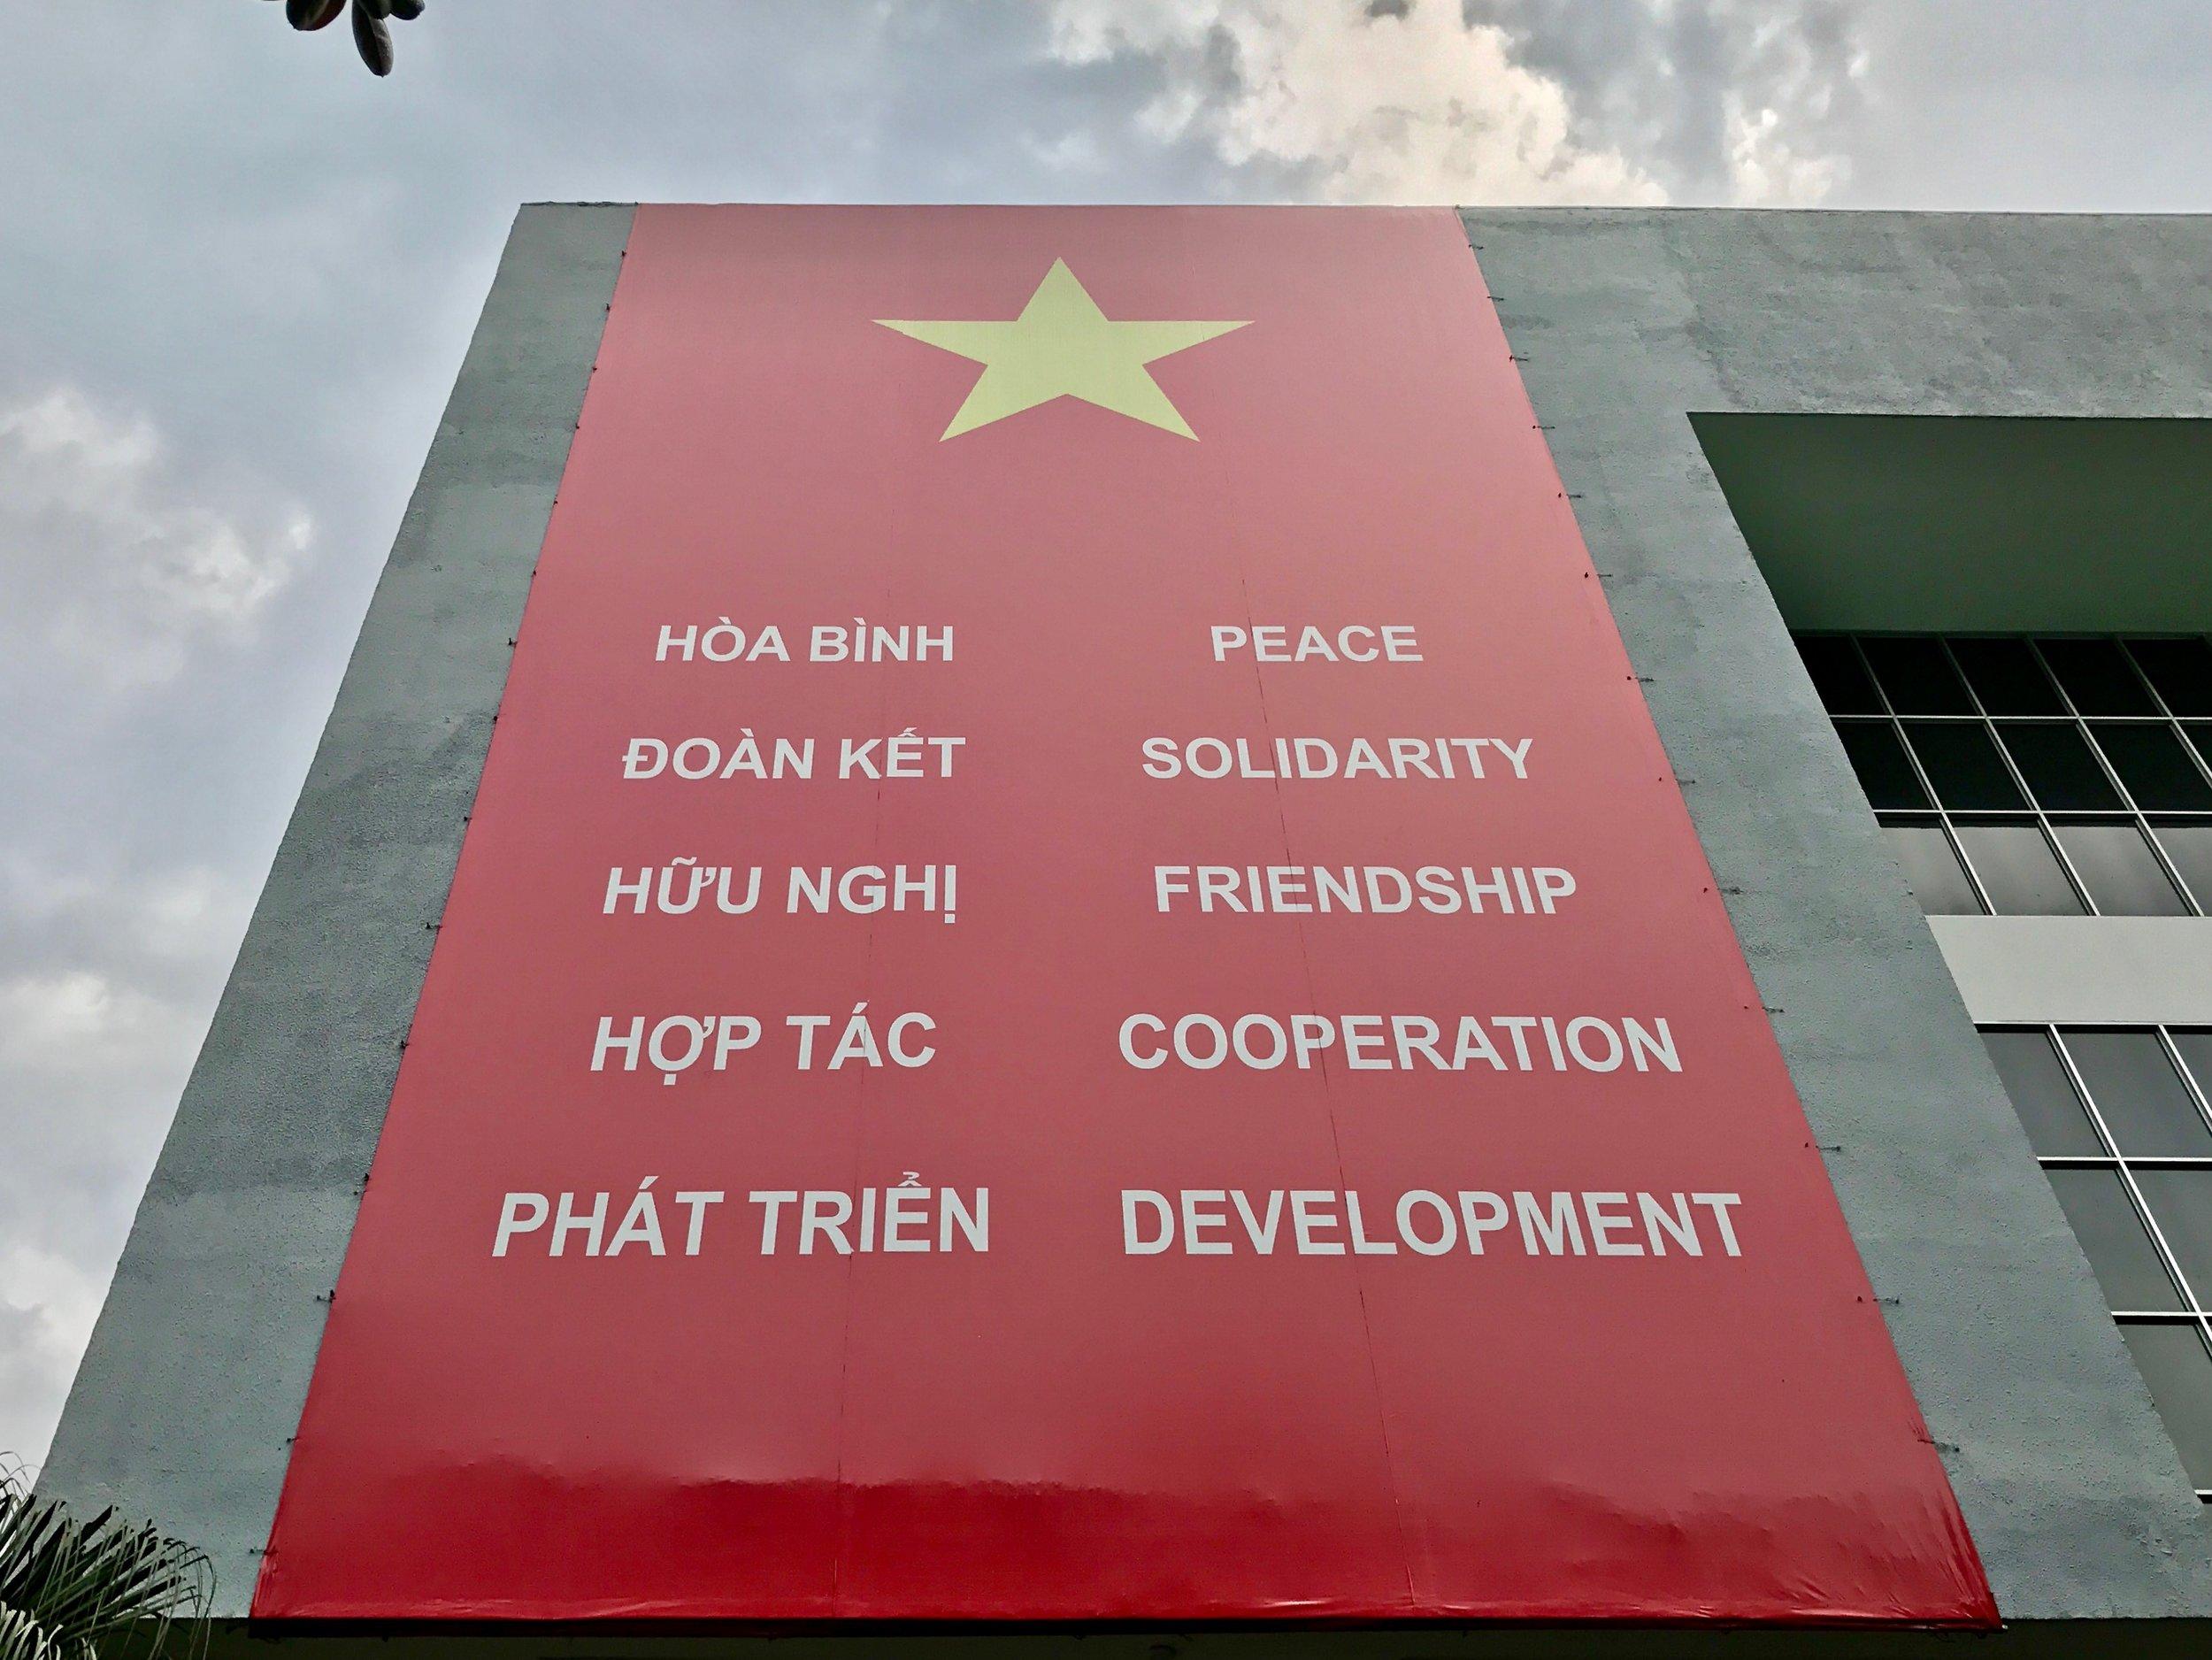 War Remnants Museum, Ho Chi Minh City, Vietnam